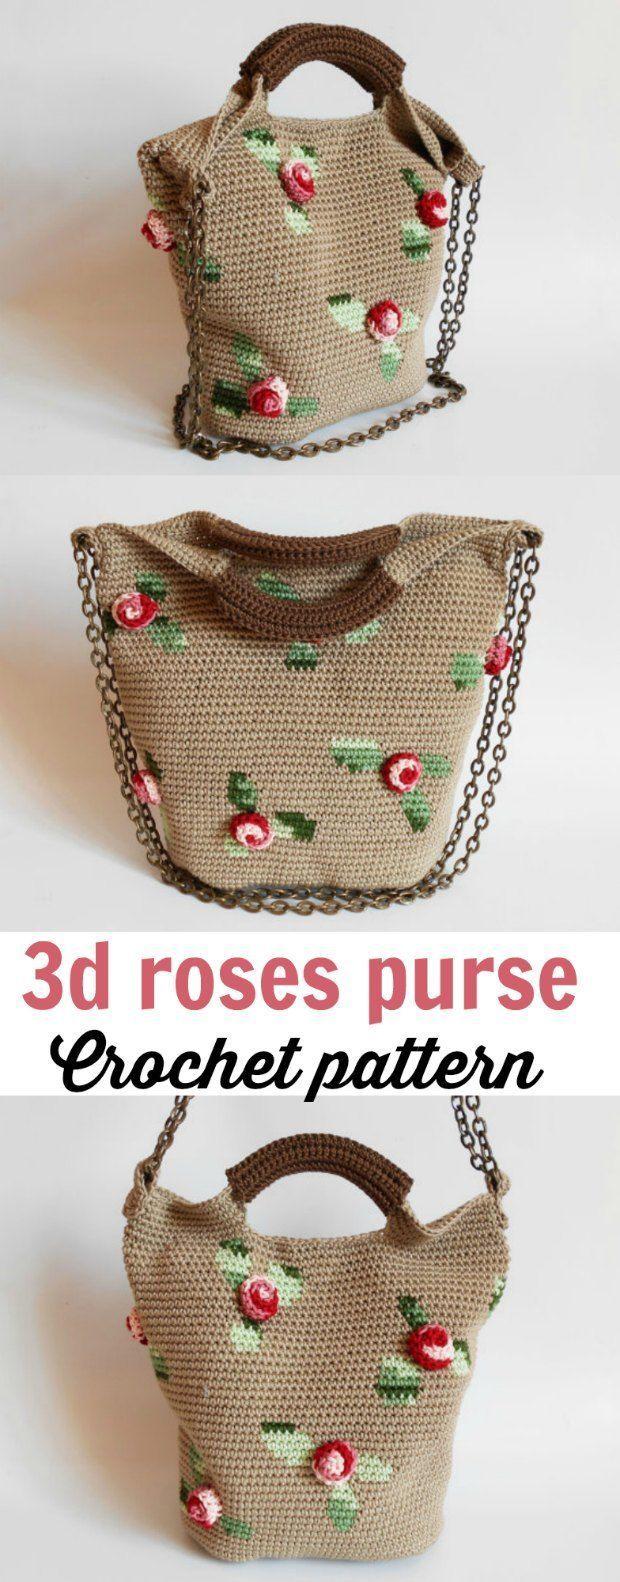 424 best crochet patterns tutorials images on pinterest crochet bag with roses intermediate pattern crochet news bankloansurffo Choice Image